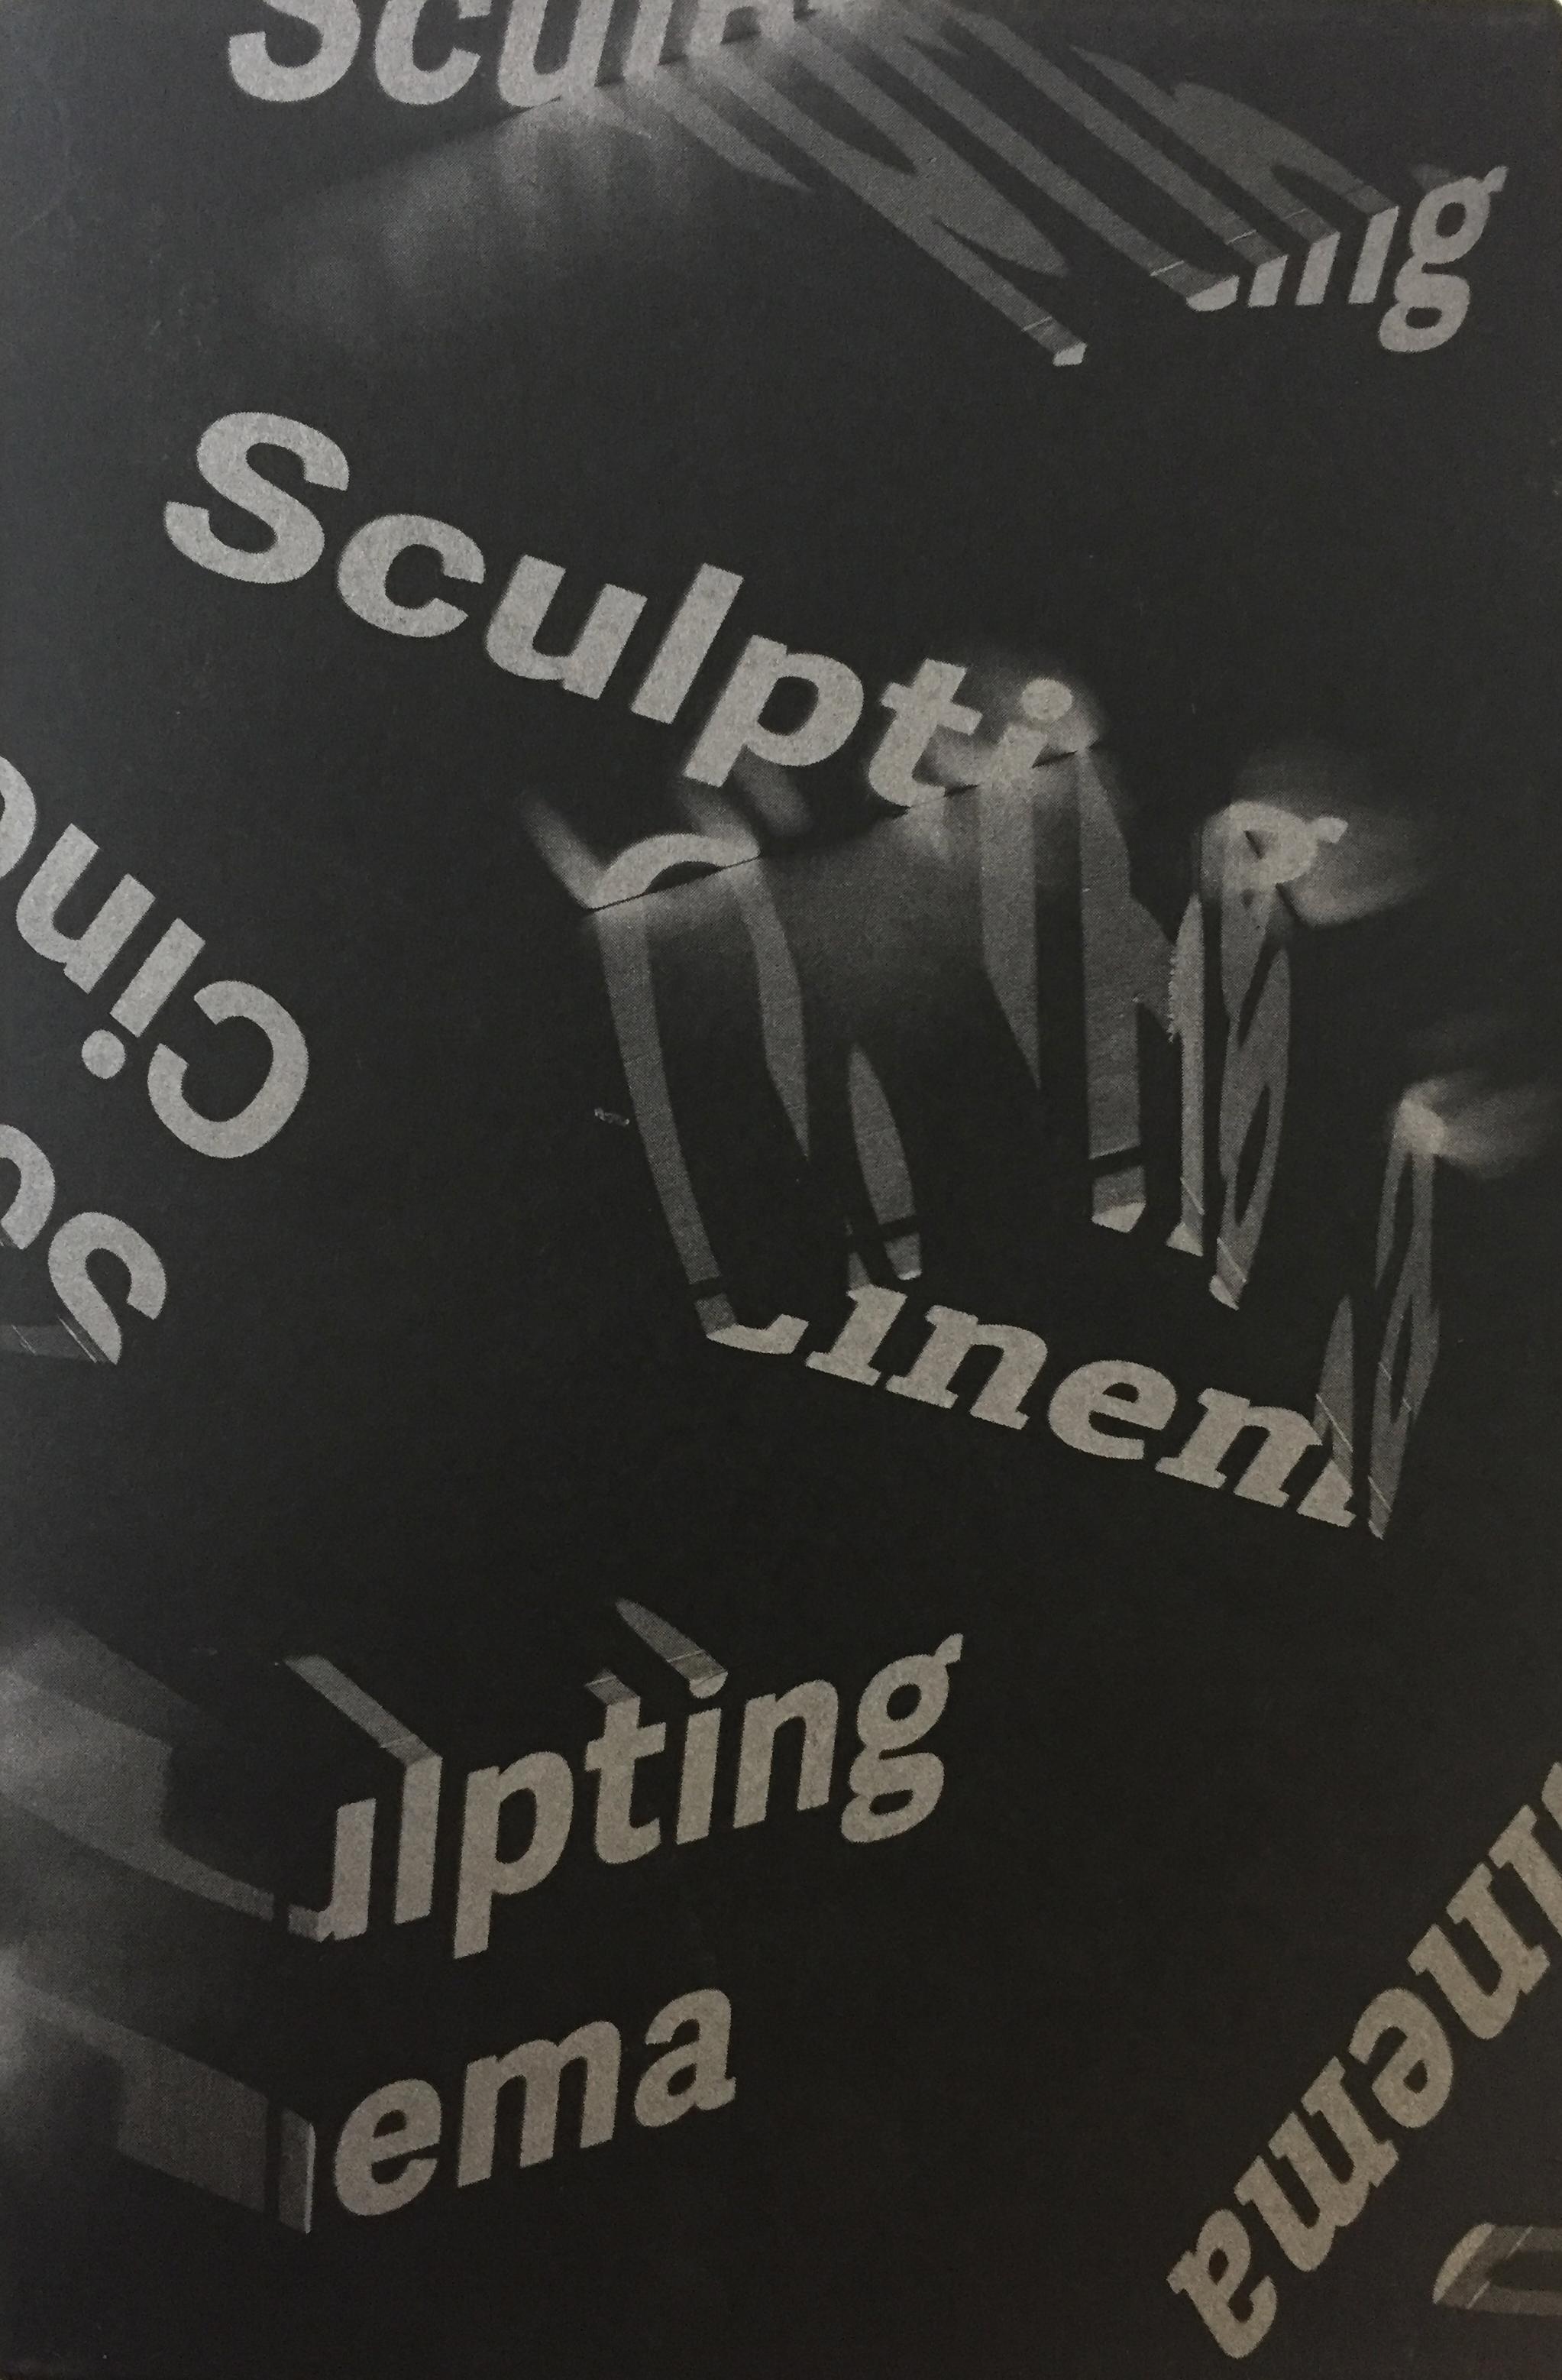 Sculpting Cinema Cover.jpeg